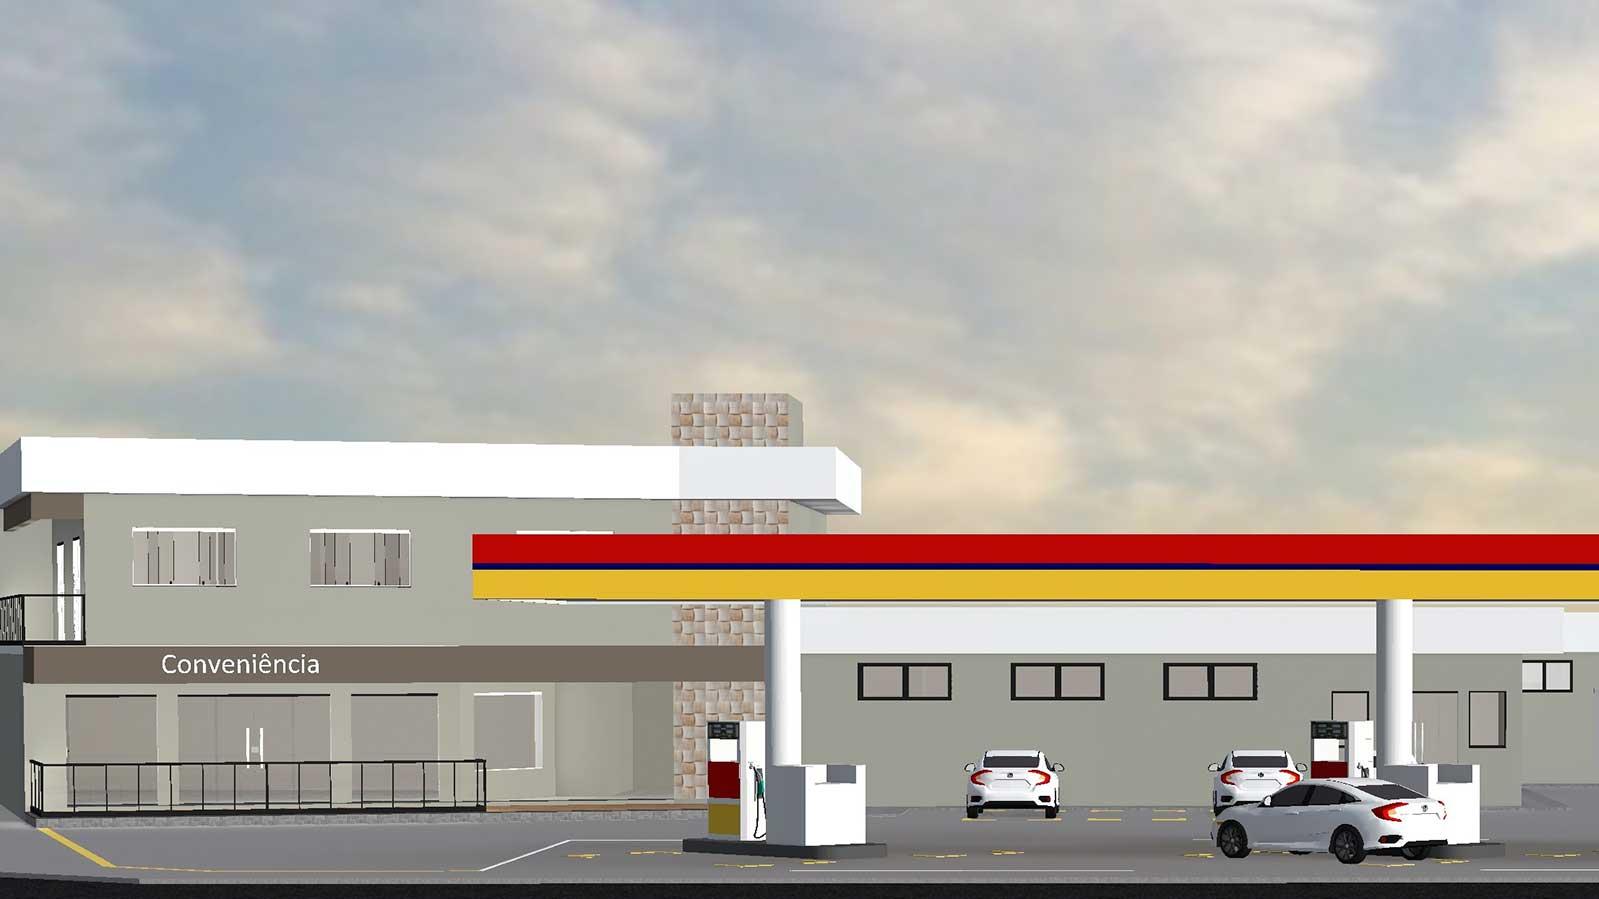 Posto-de-gasolina